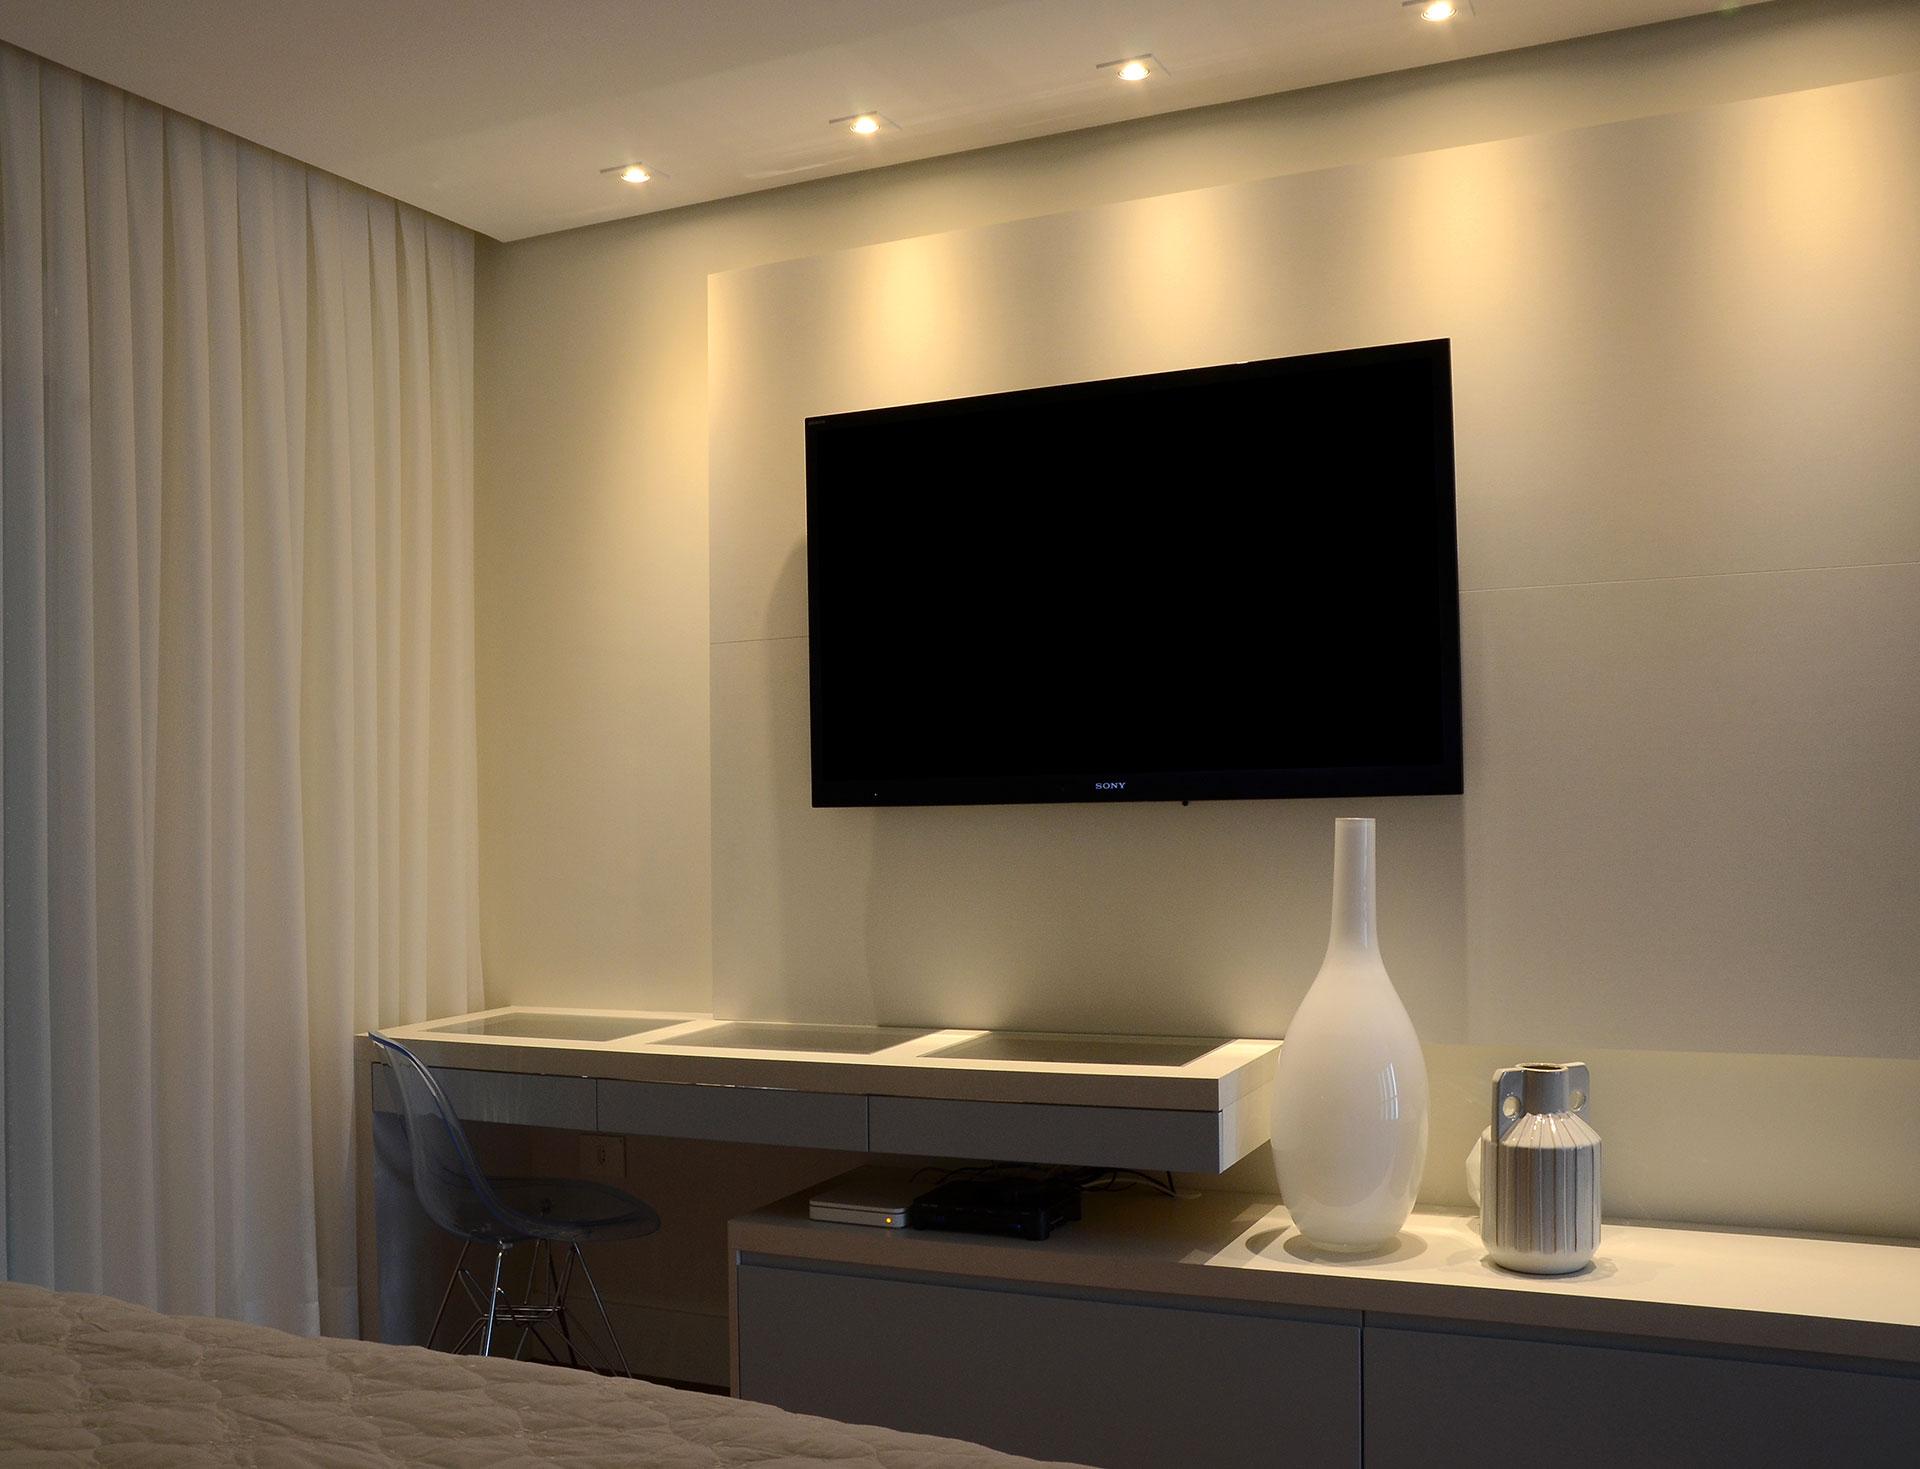 portfolio-cynthia-rolnik-apartamento1-02